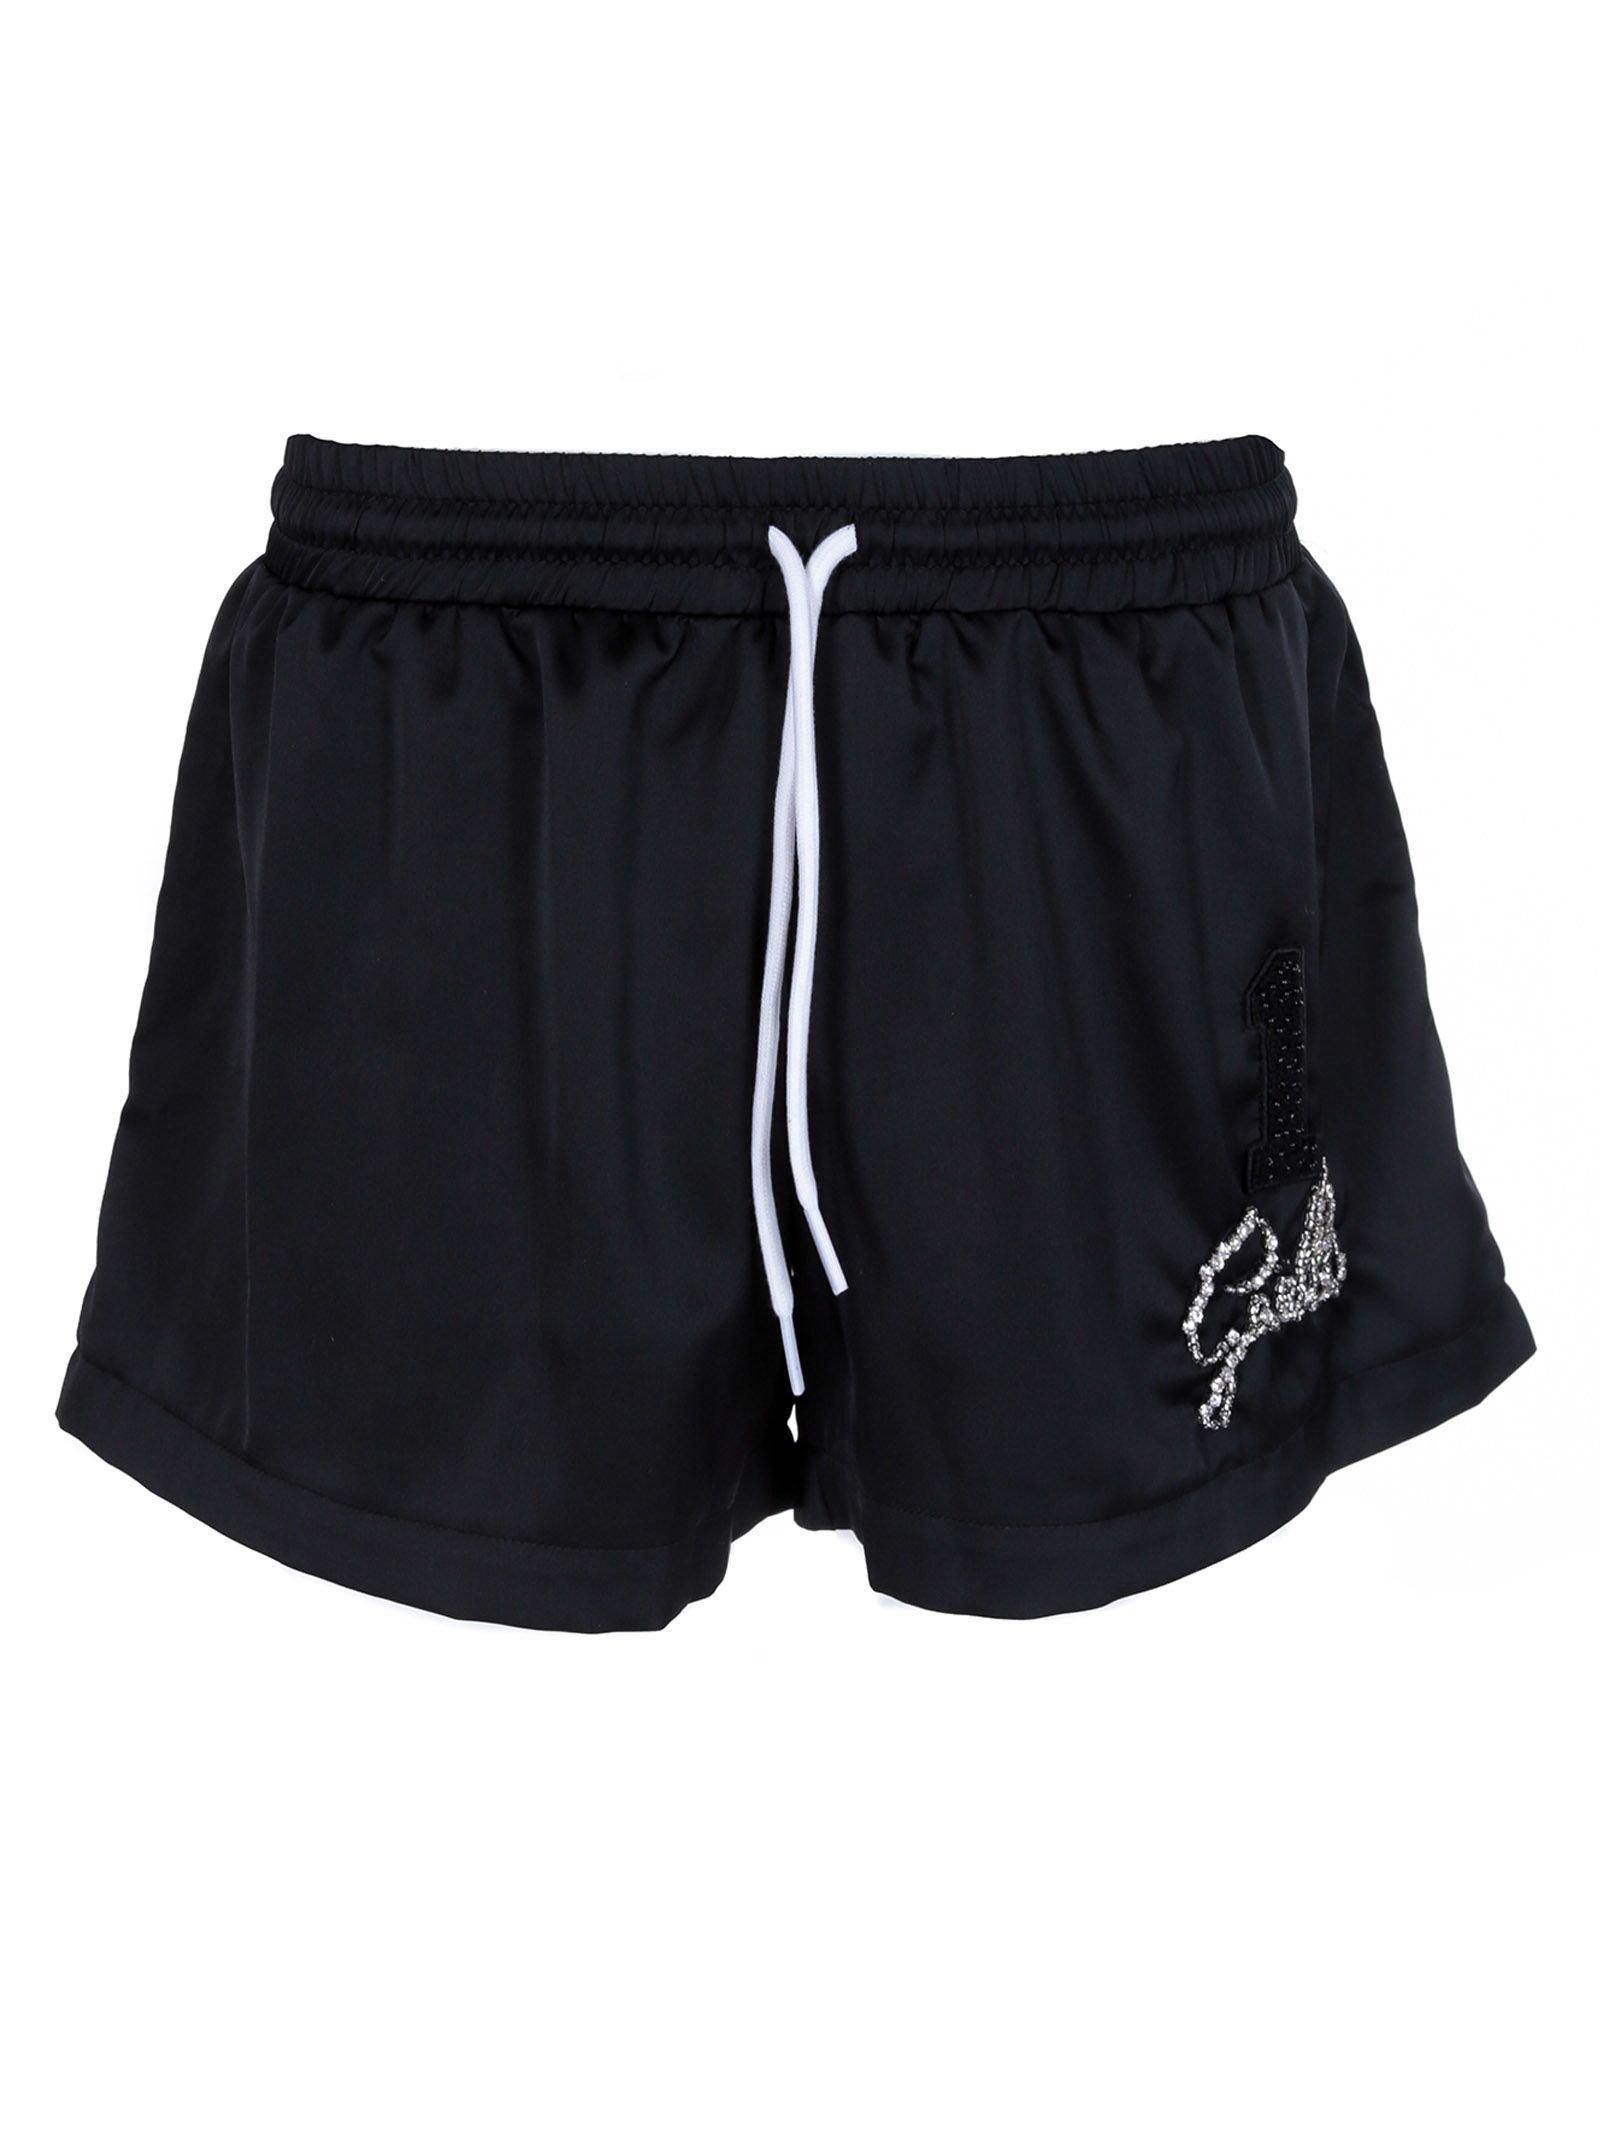 Gaelle Bonheur Embellished Shorts